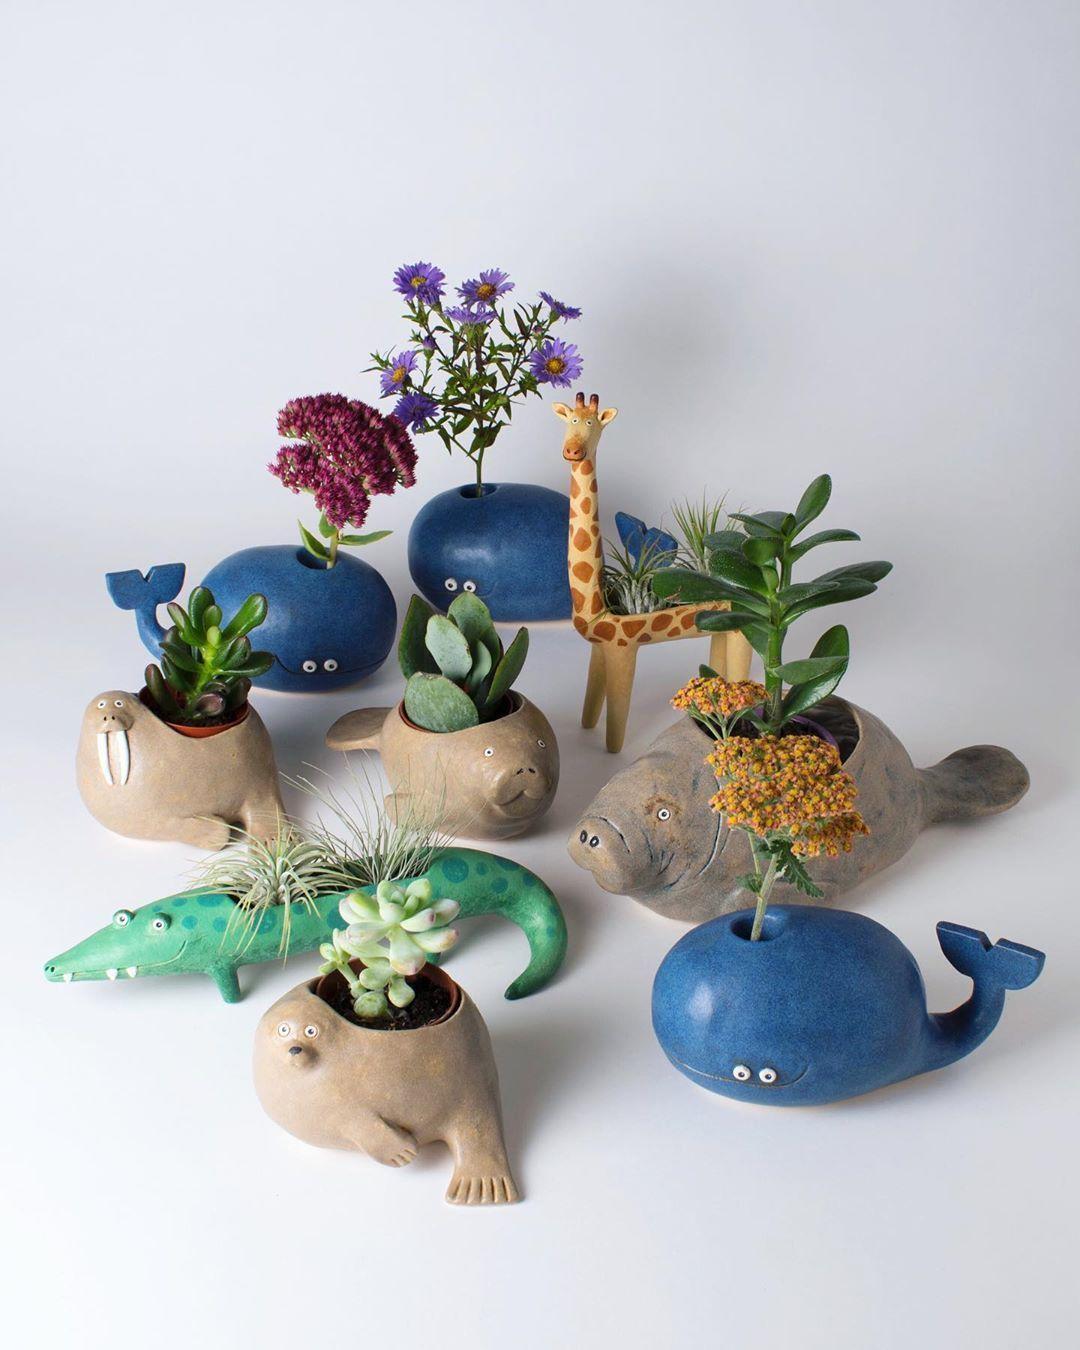 beautiful ceramic creatures noseymungo helen burgess